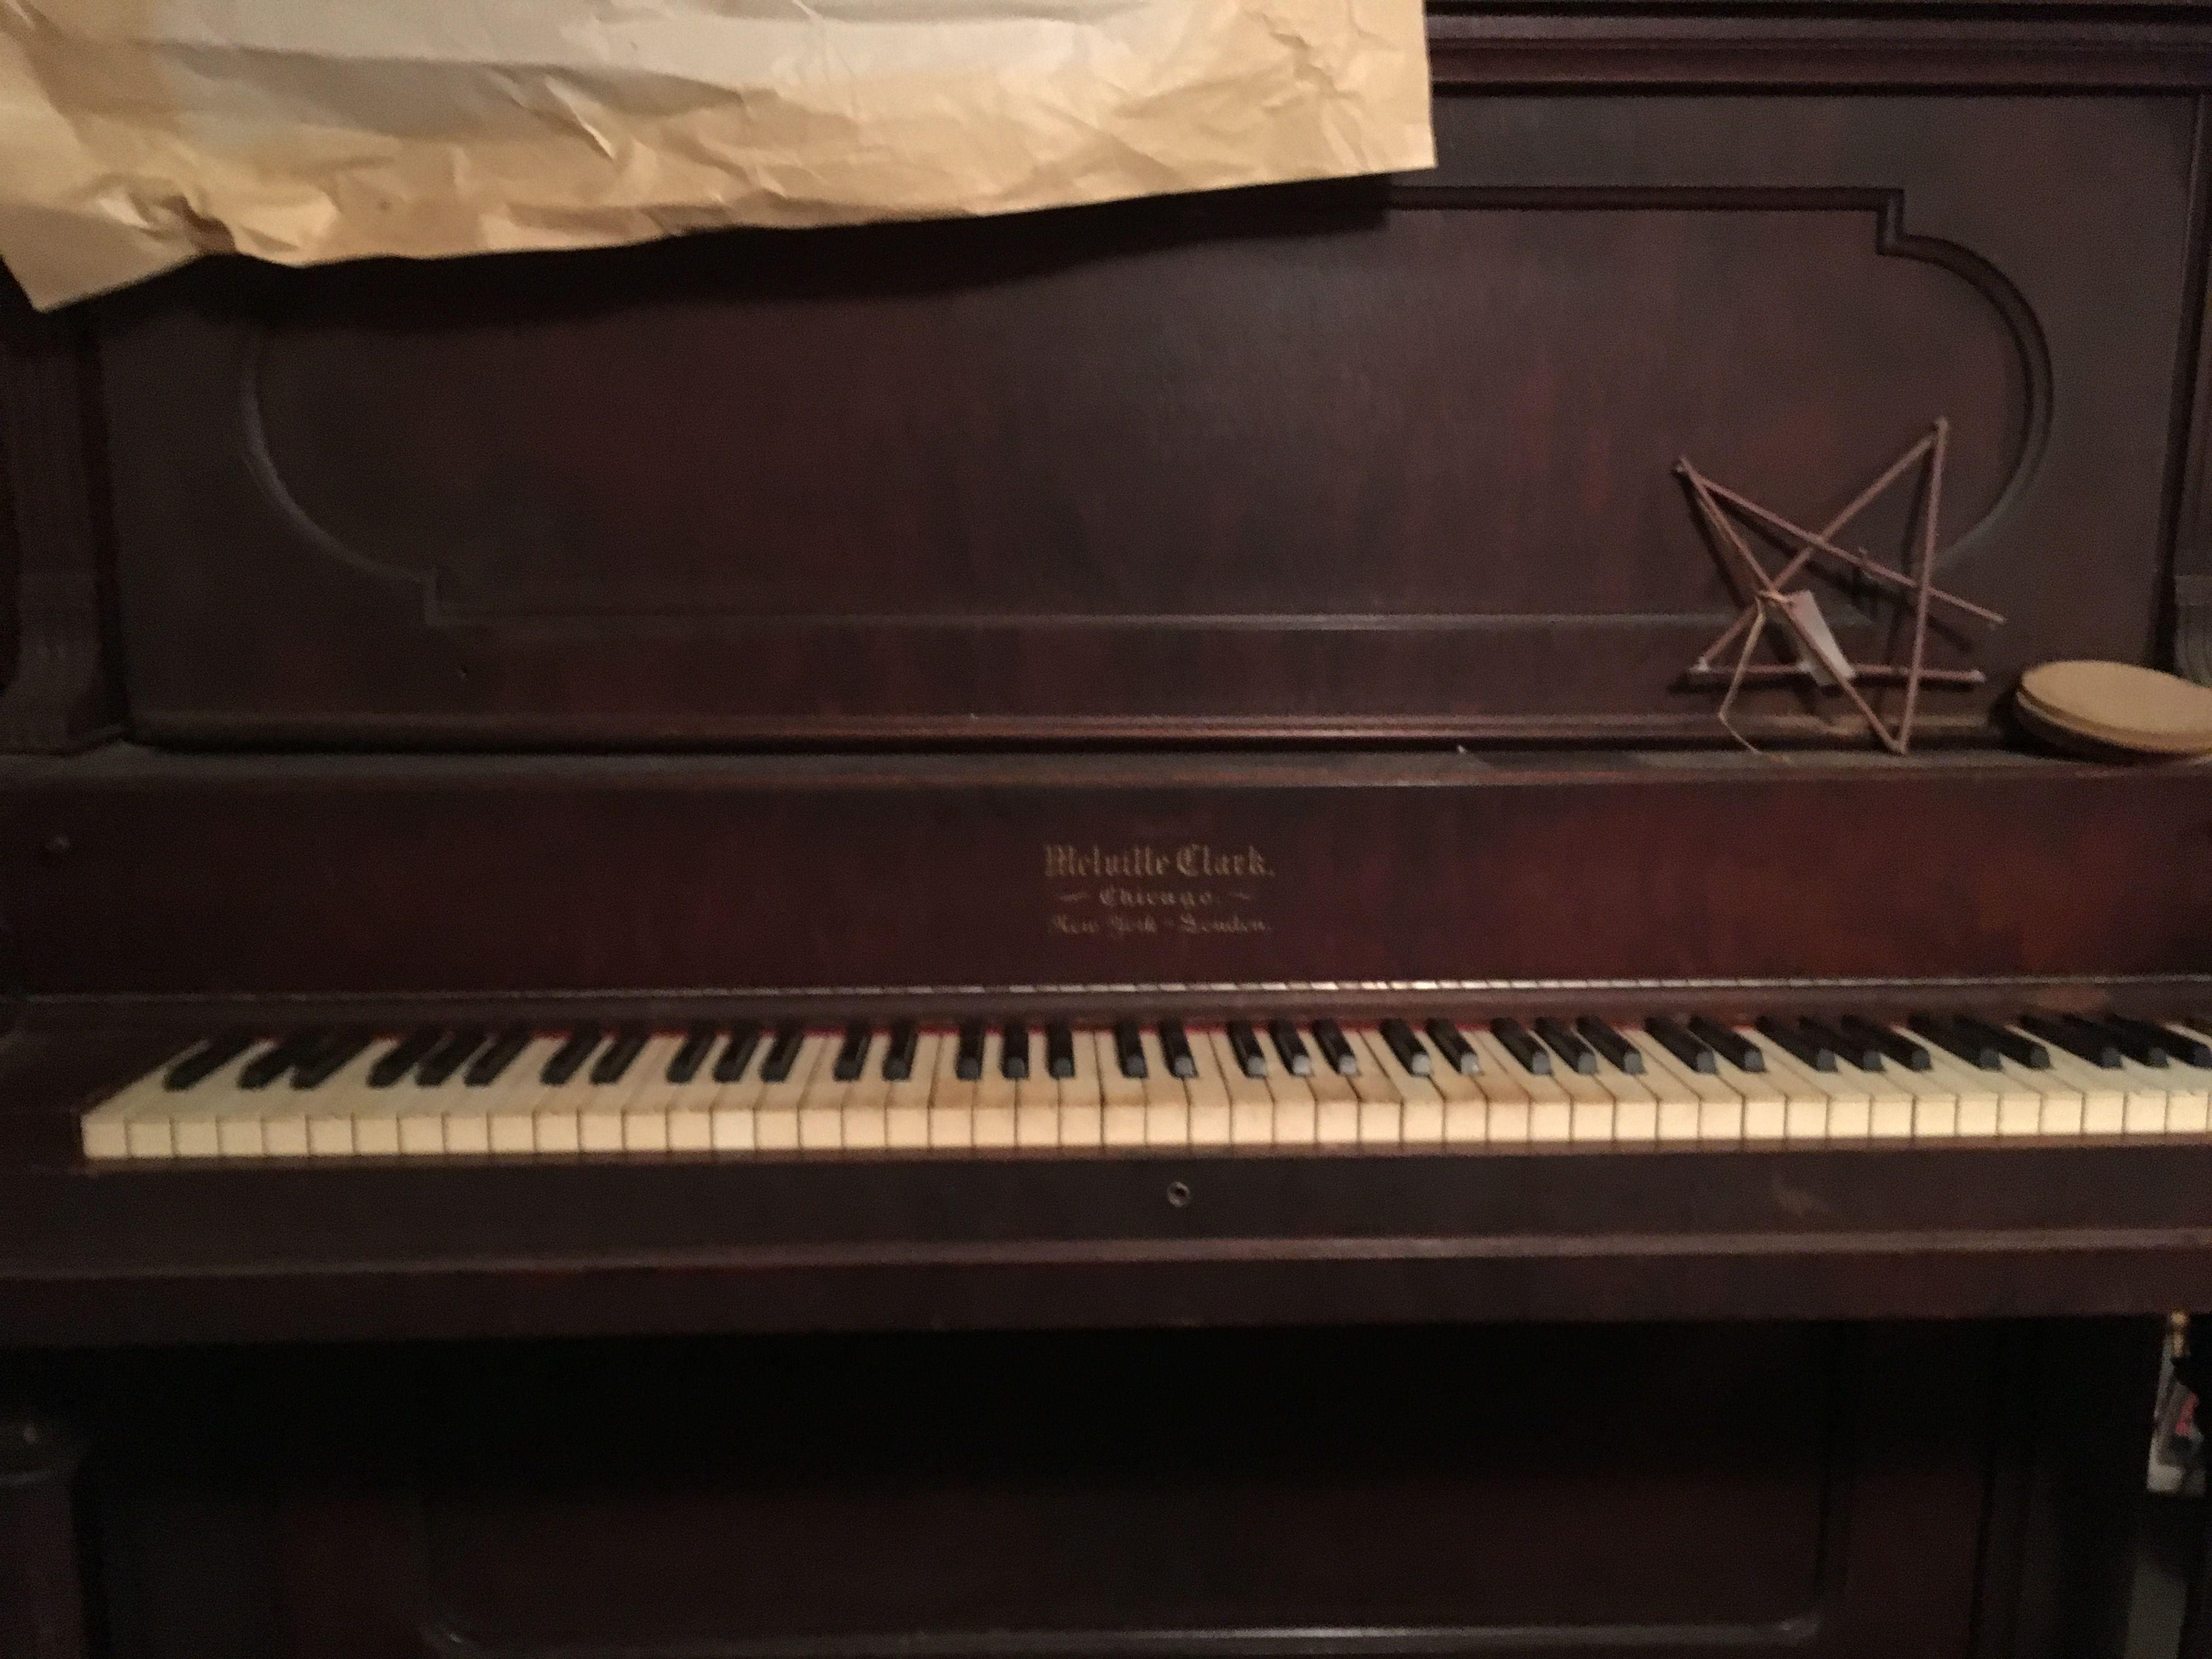 upright piano-FREE image 1